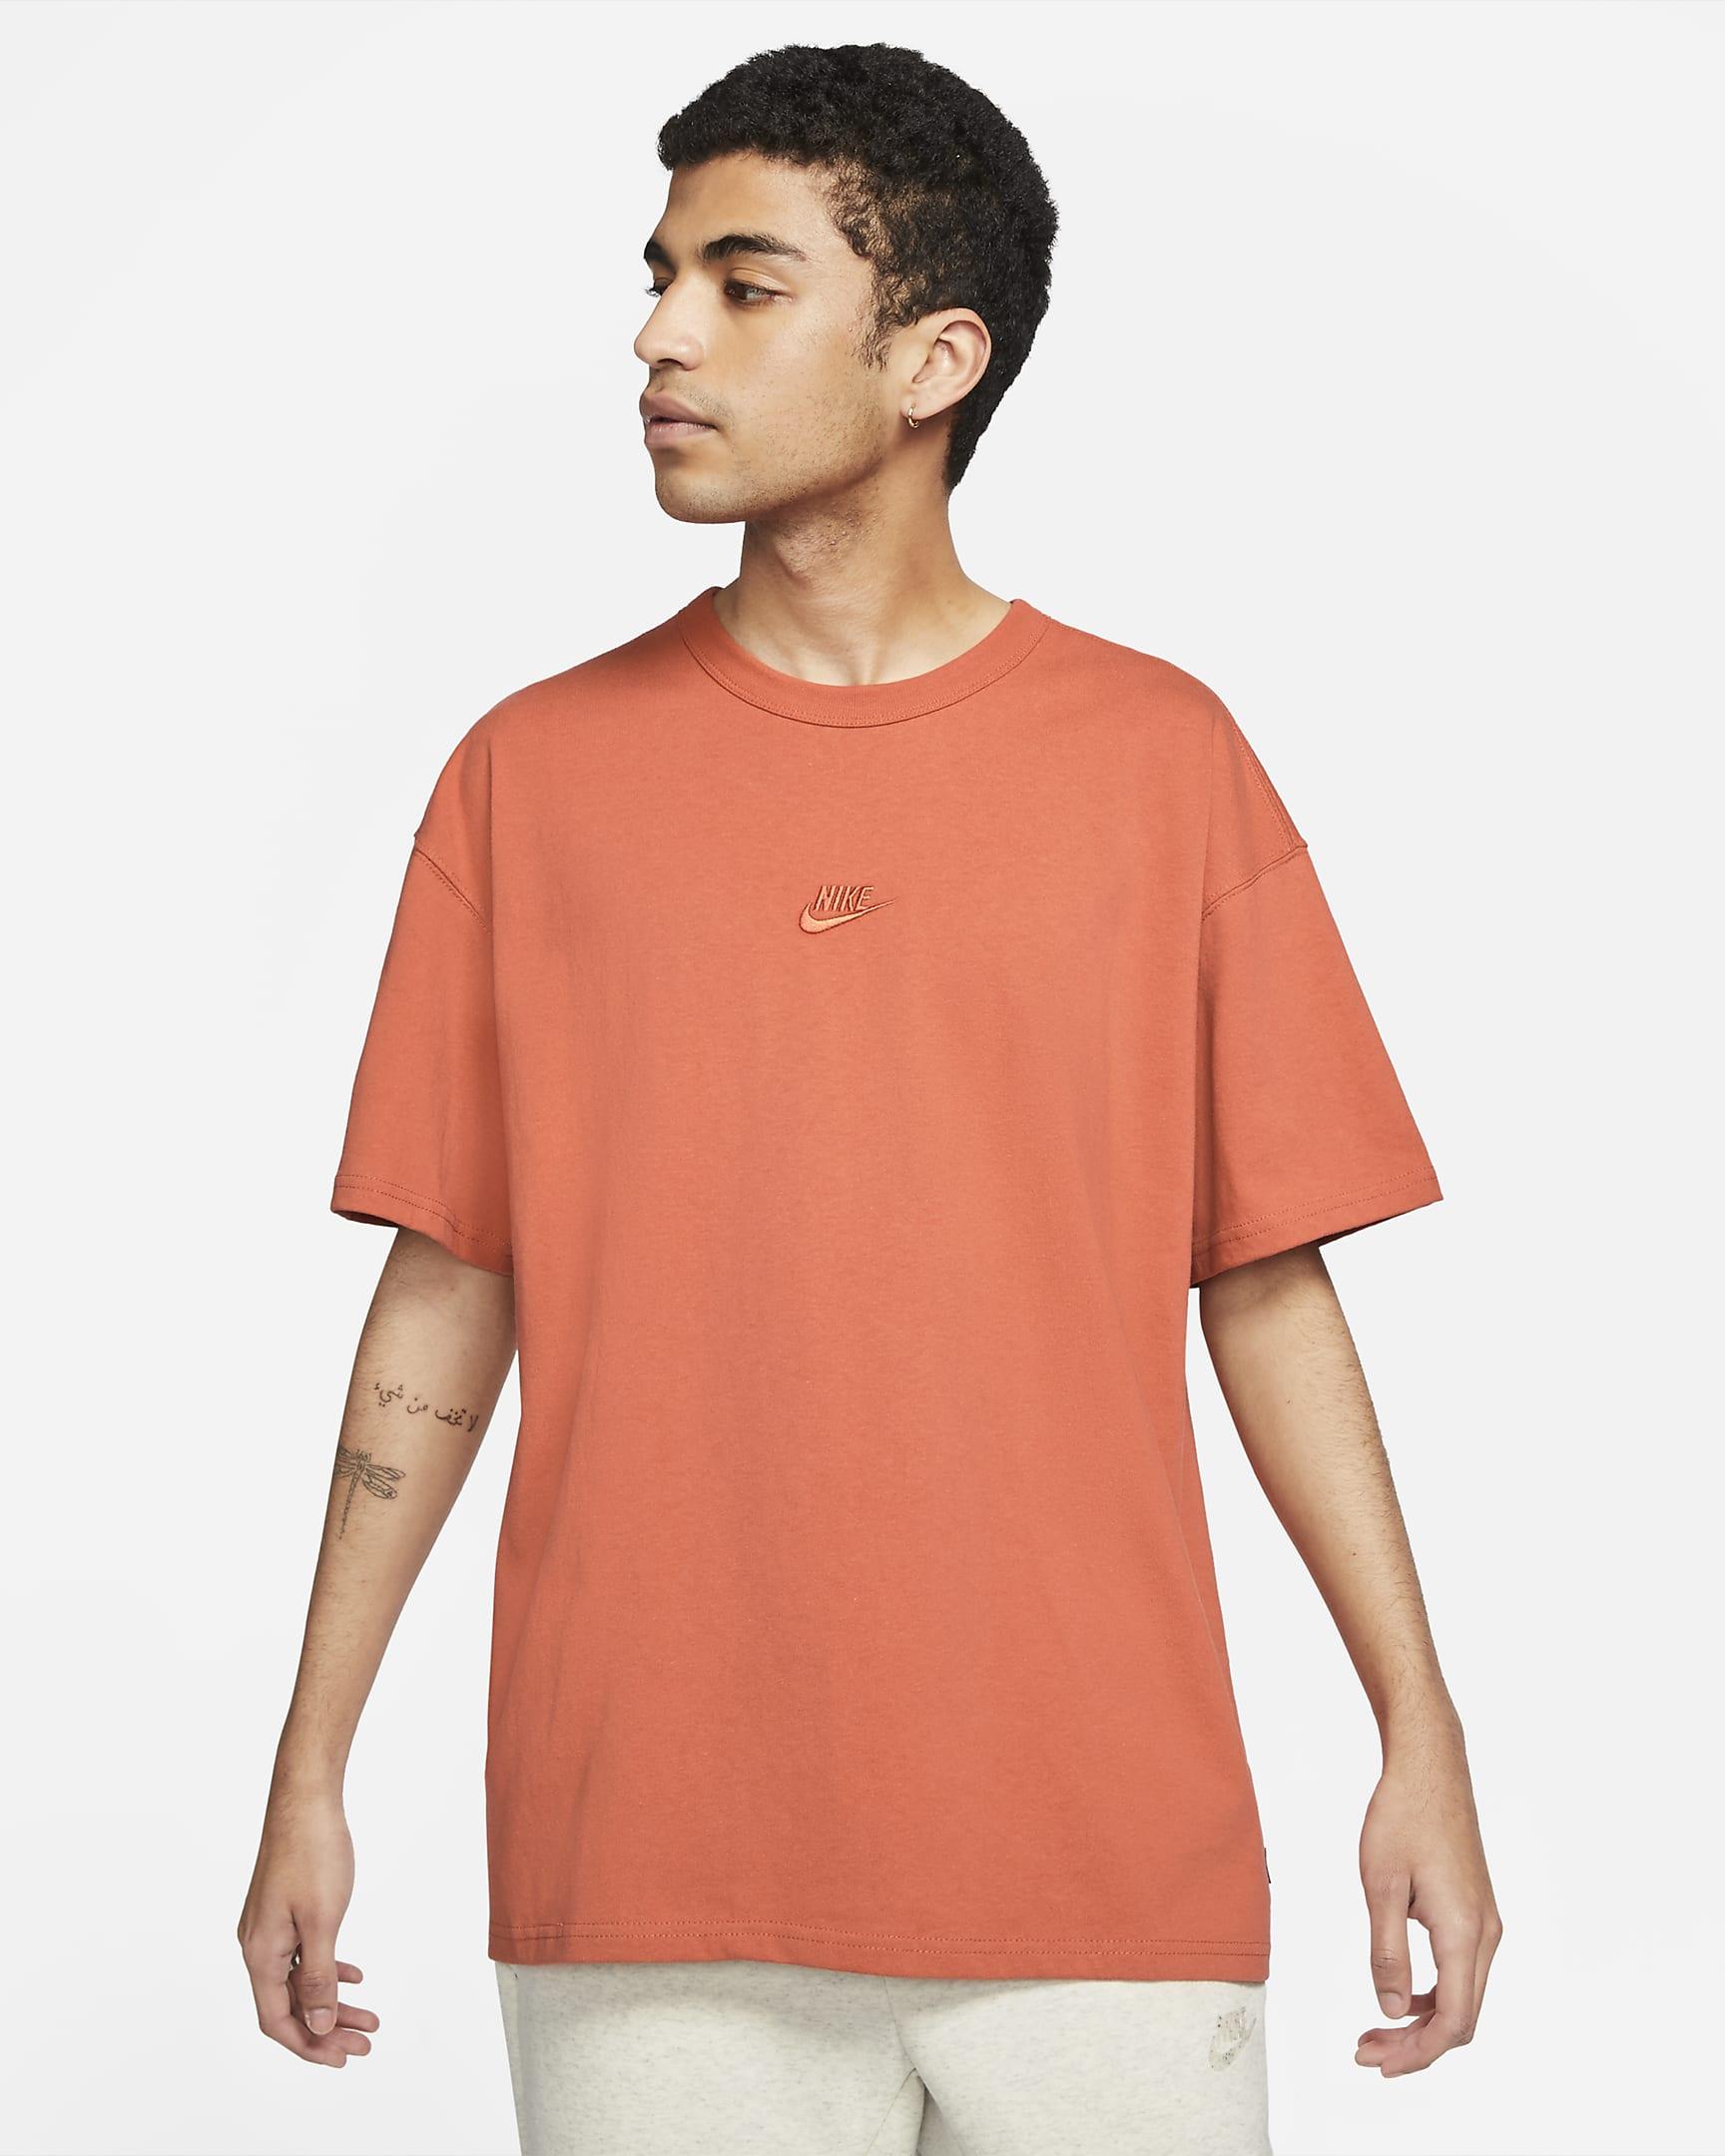 sportswear-premium-essential-mens-t-shirt-SS1mBB.png